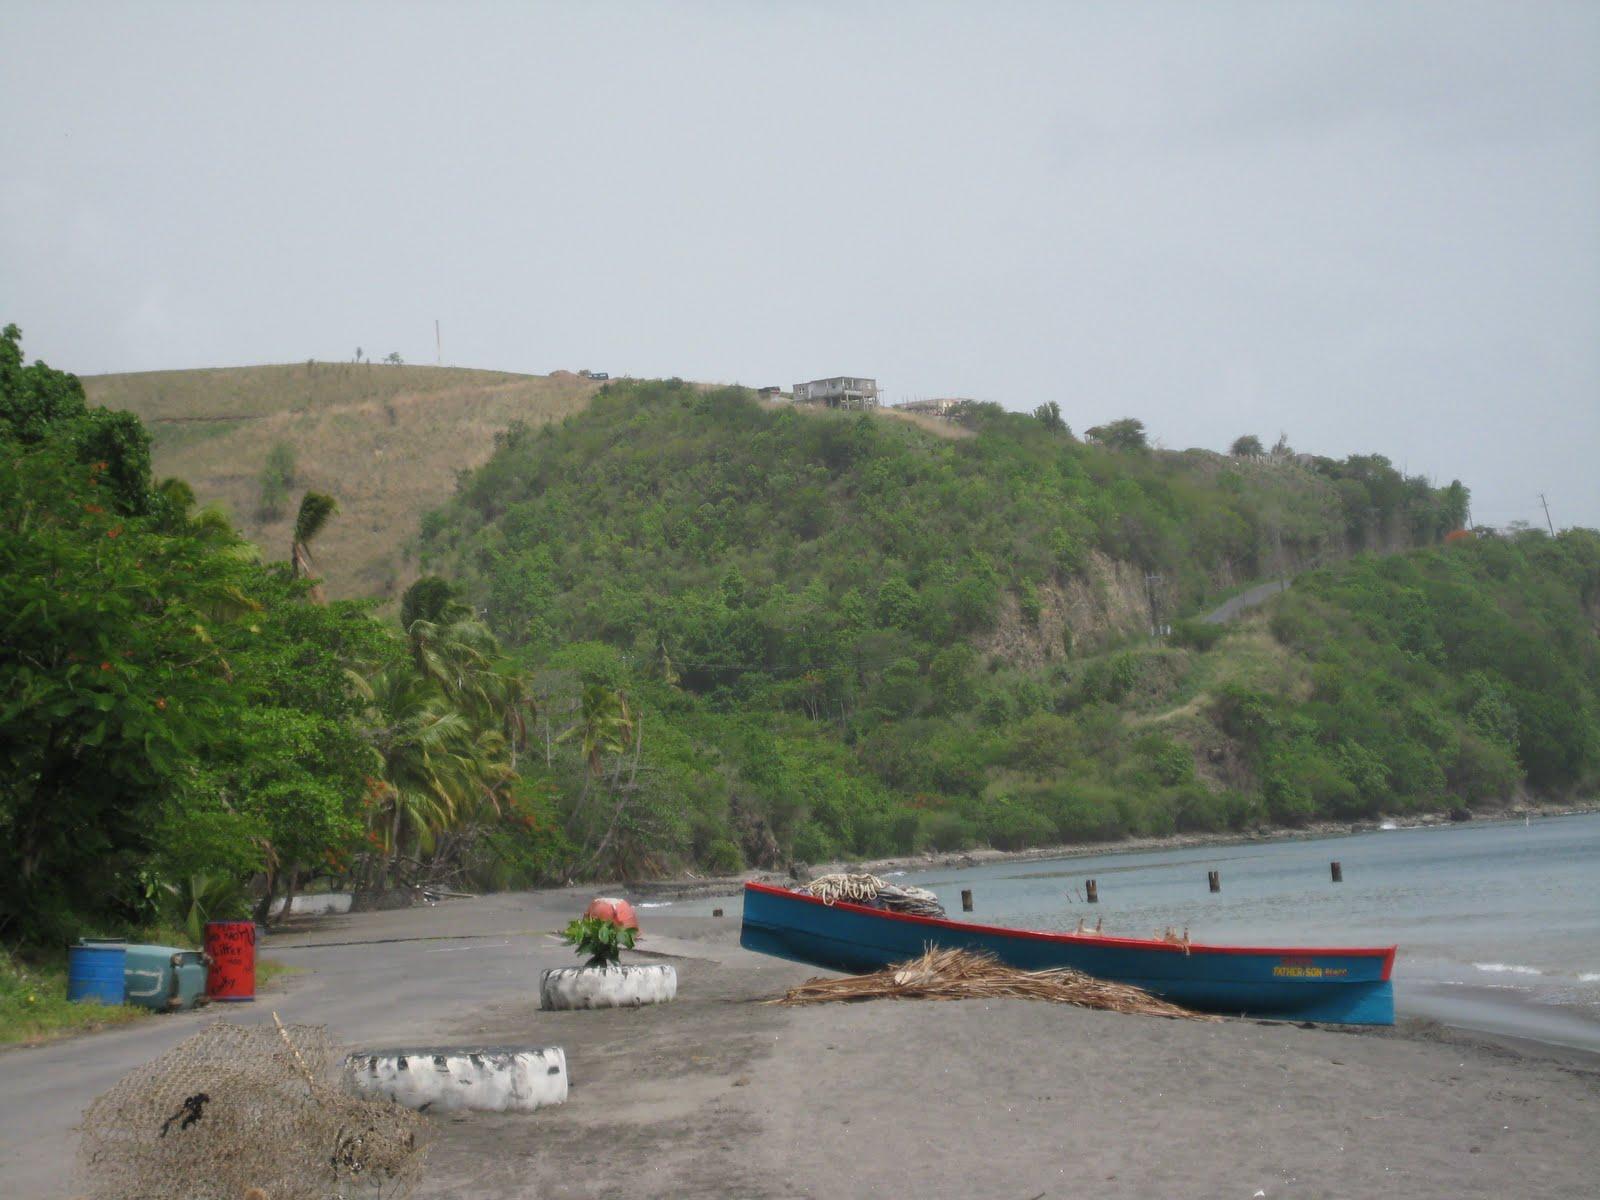 http://1.bp.blogspot.com/_6PSSy7usP8Y/TBVwgE8d5EI/AAAAAAAACAw/L6Xs0LNgISU/s1600/57+Volcanic+black+beach,+Dominica.JPG